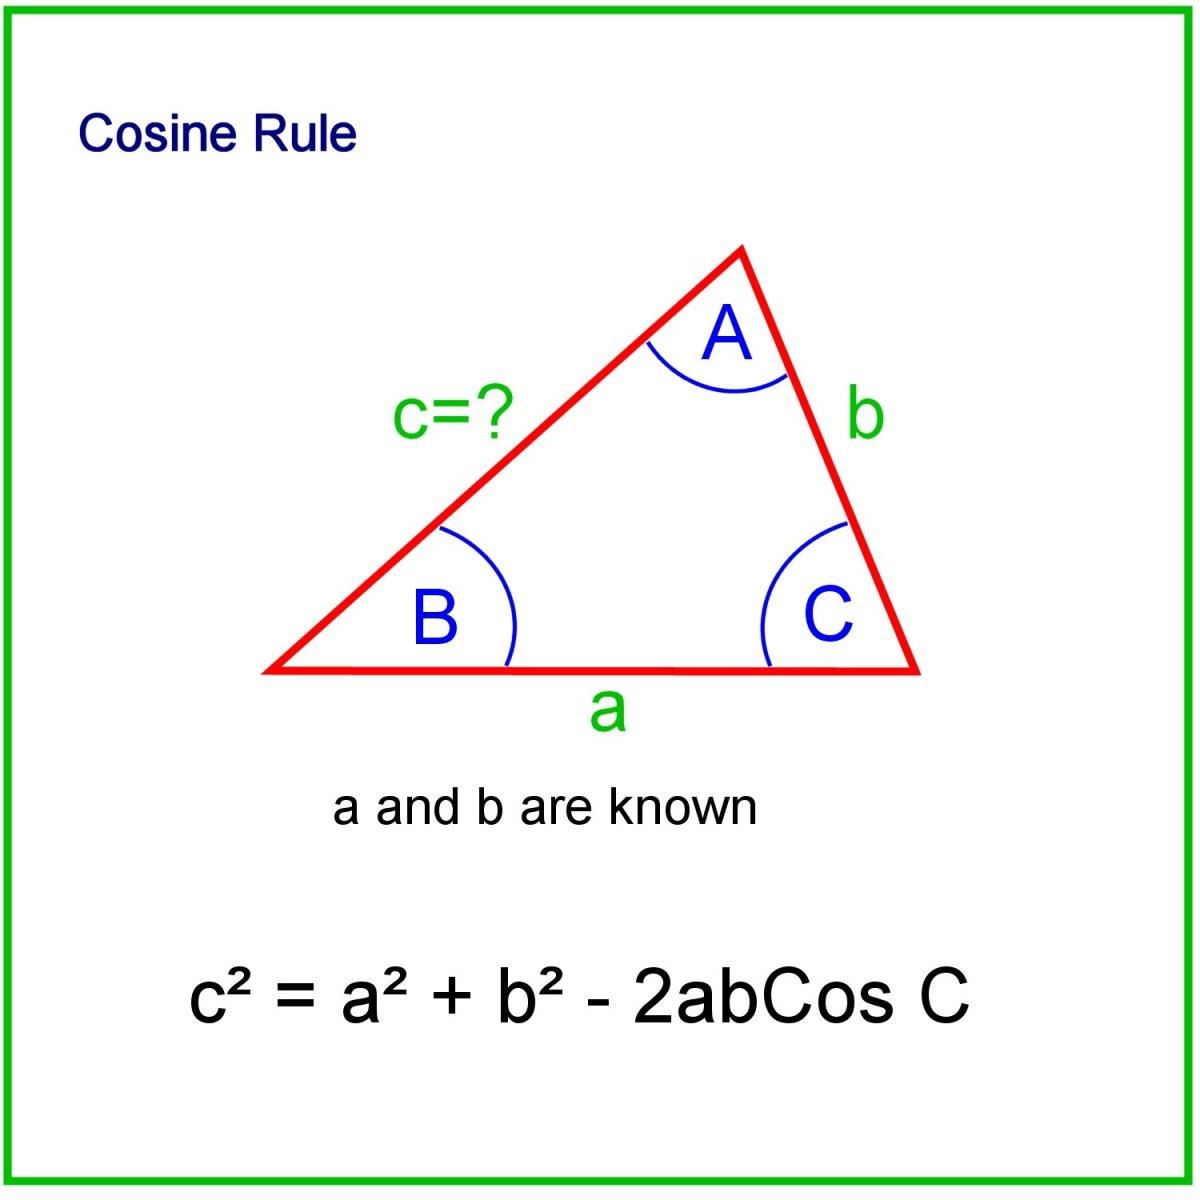 The cosine rule.